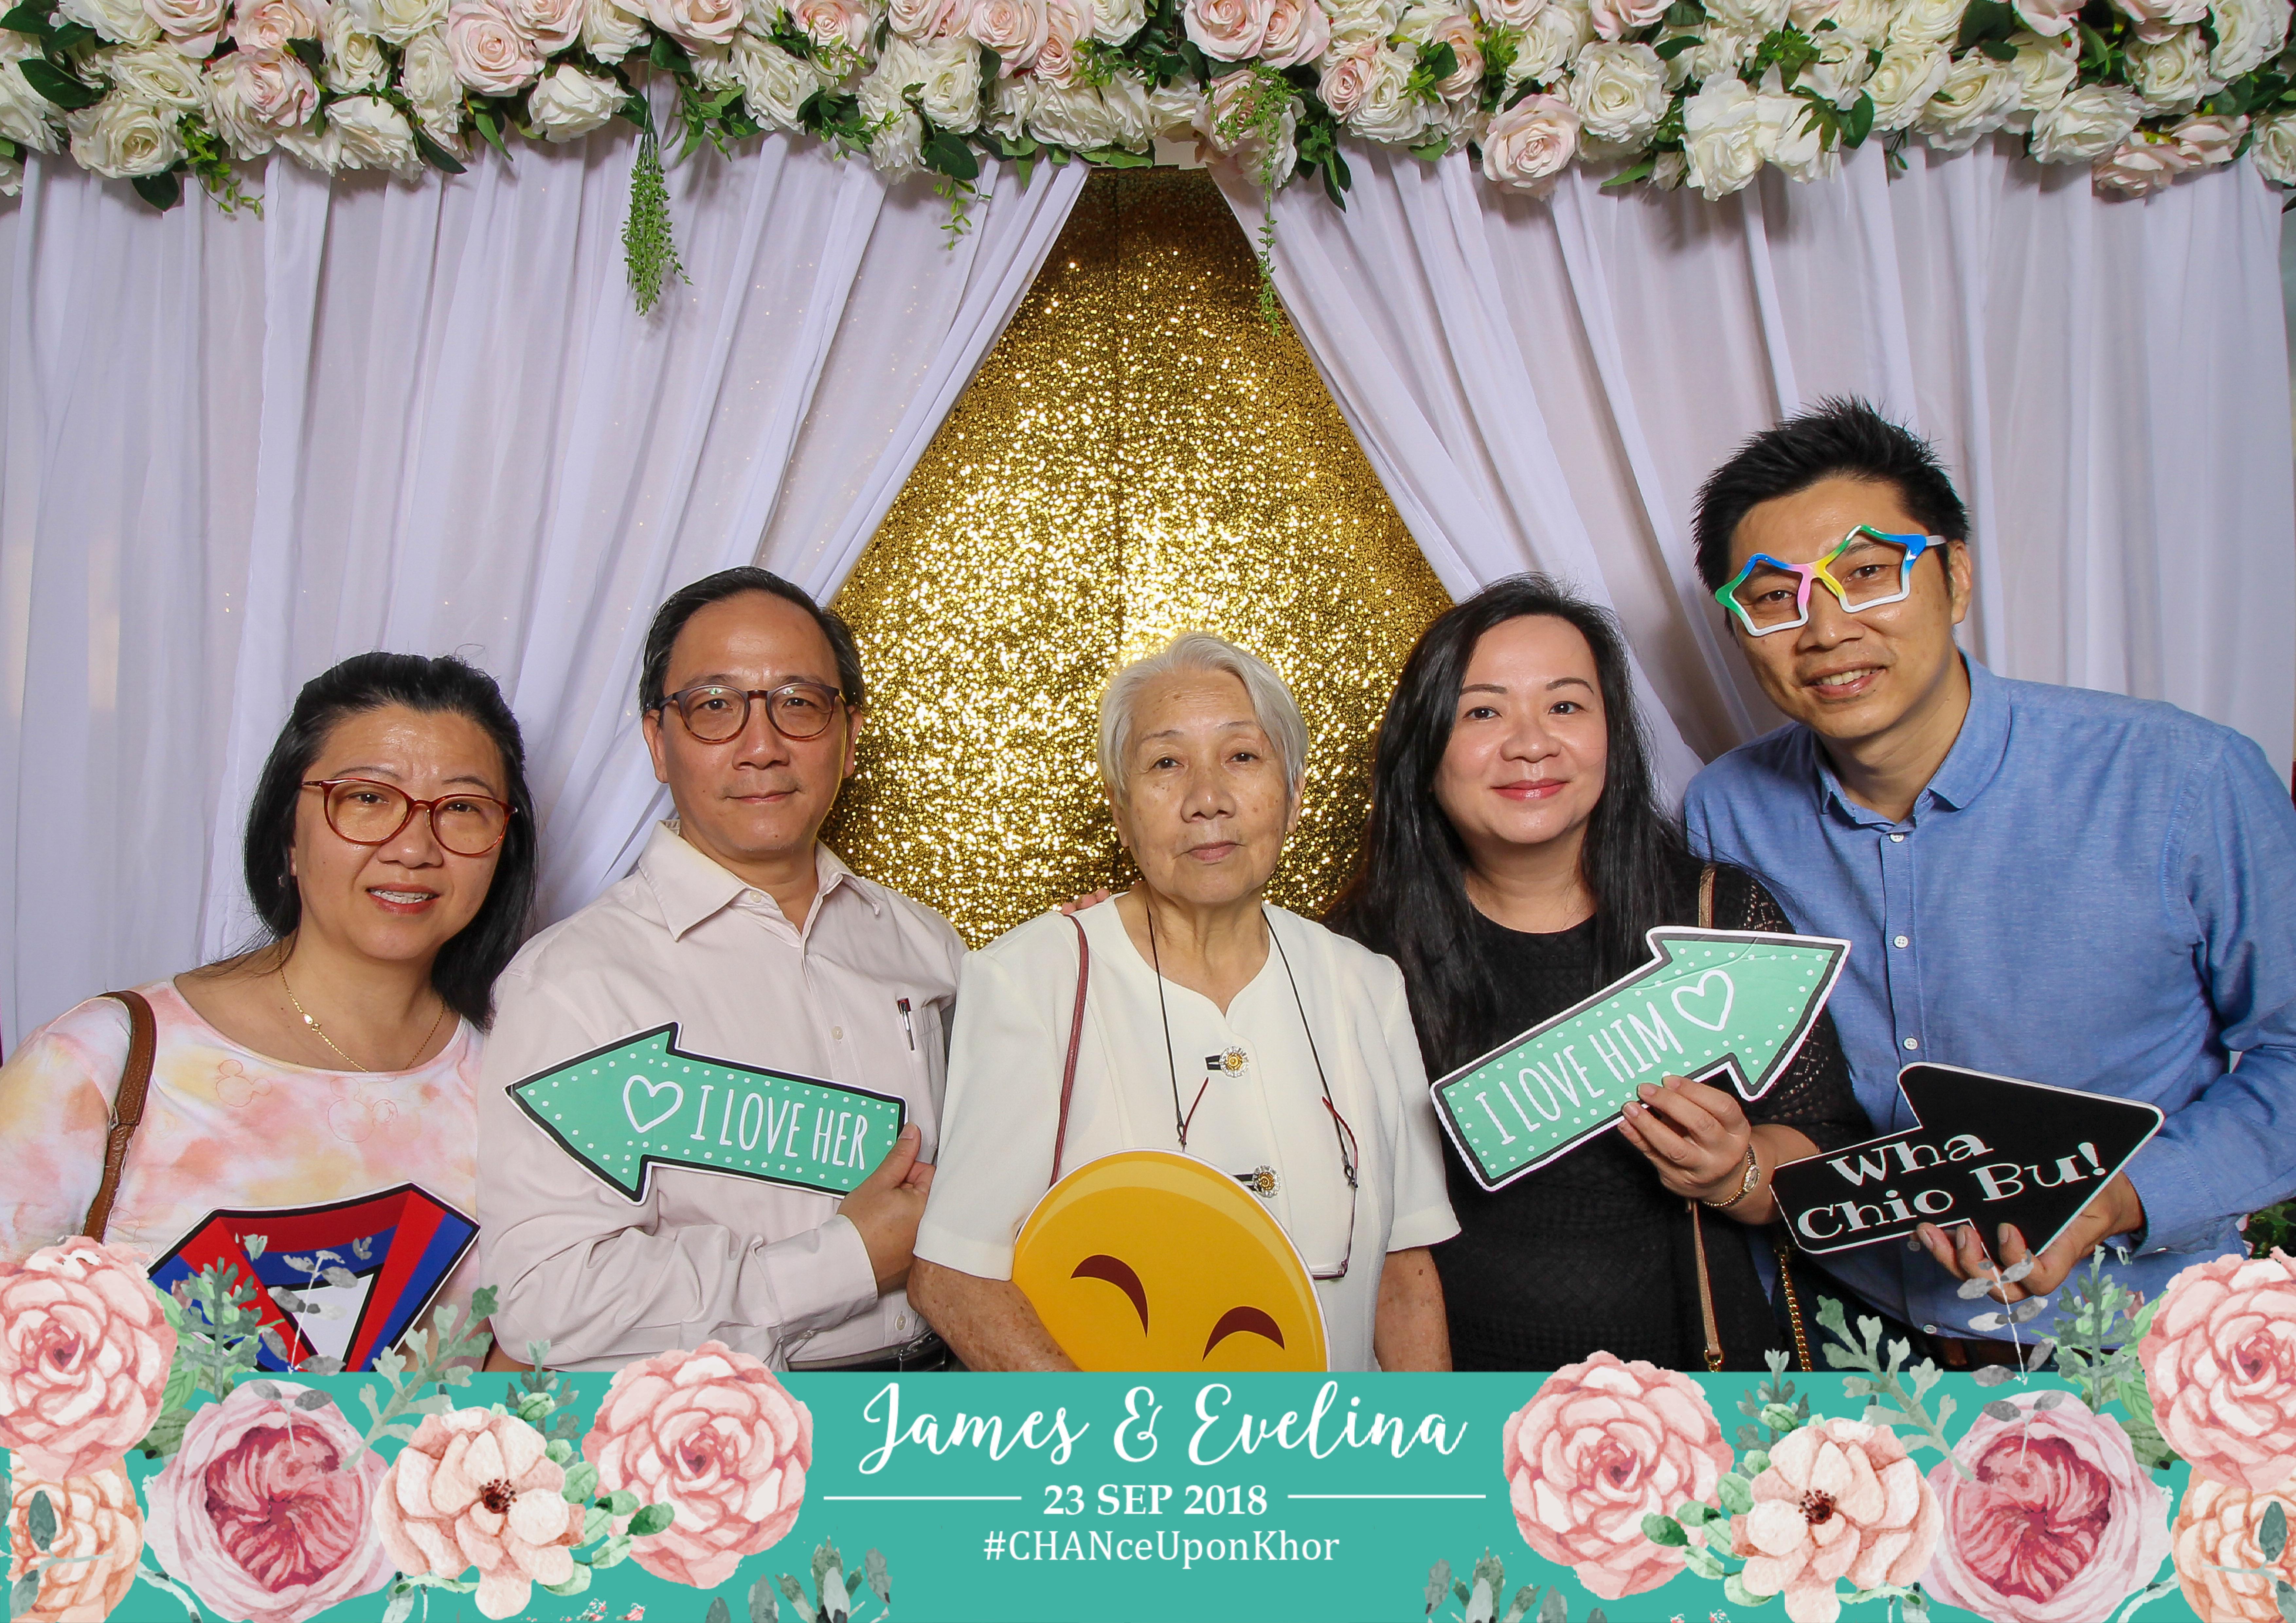 wedding photo booth singapore-60